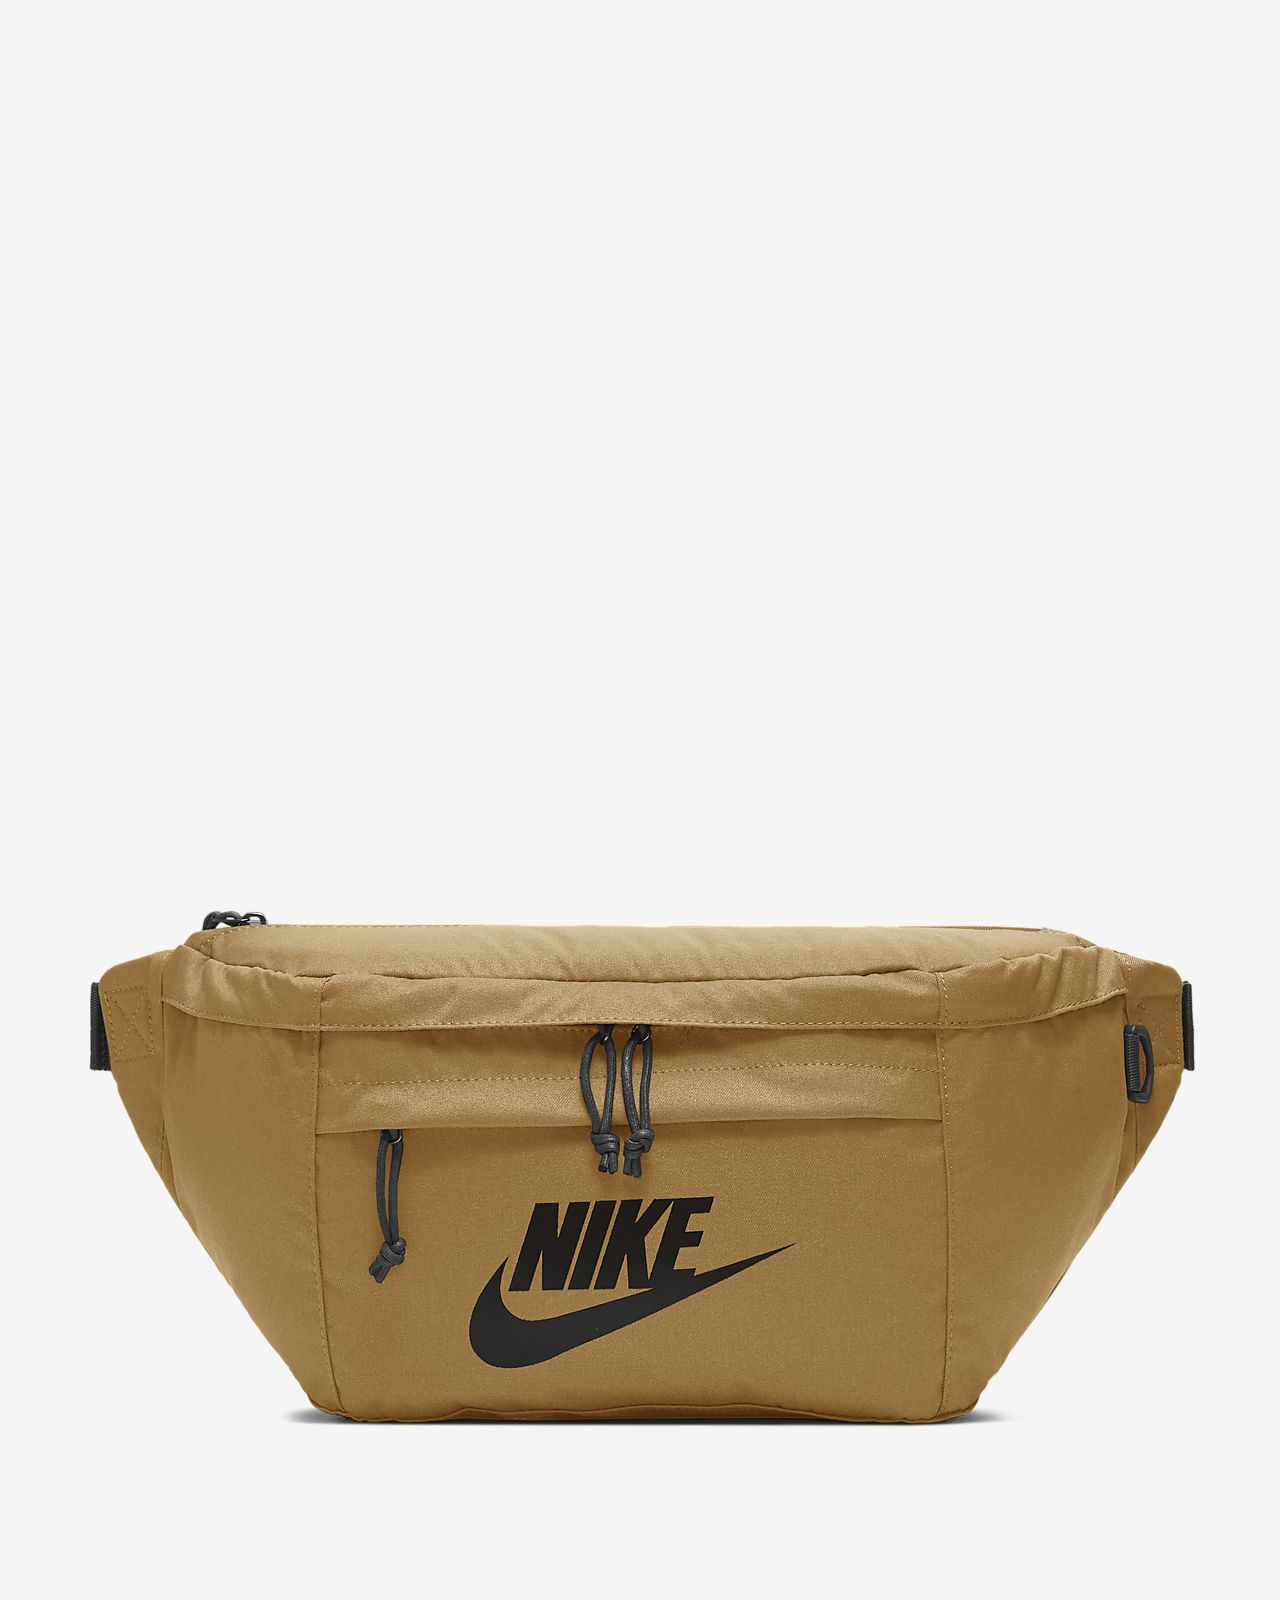 a61f933706 Low Resolution Sac banane Nike Tech Sac banane Nike Tech